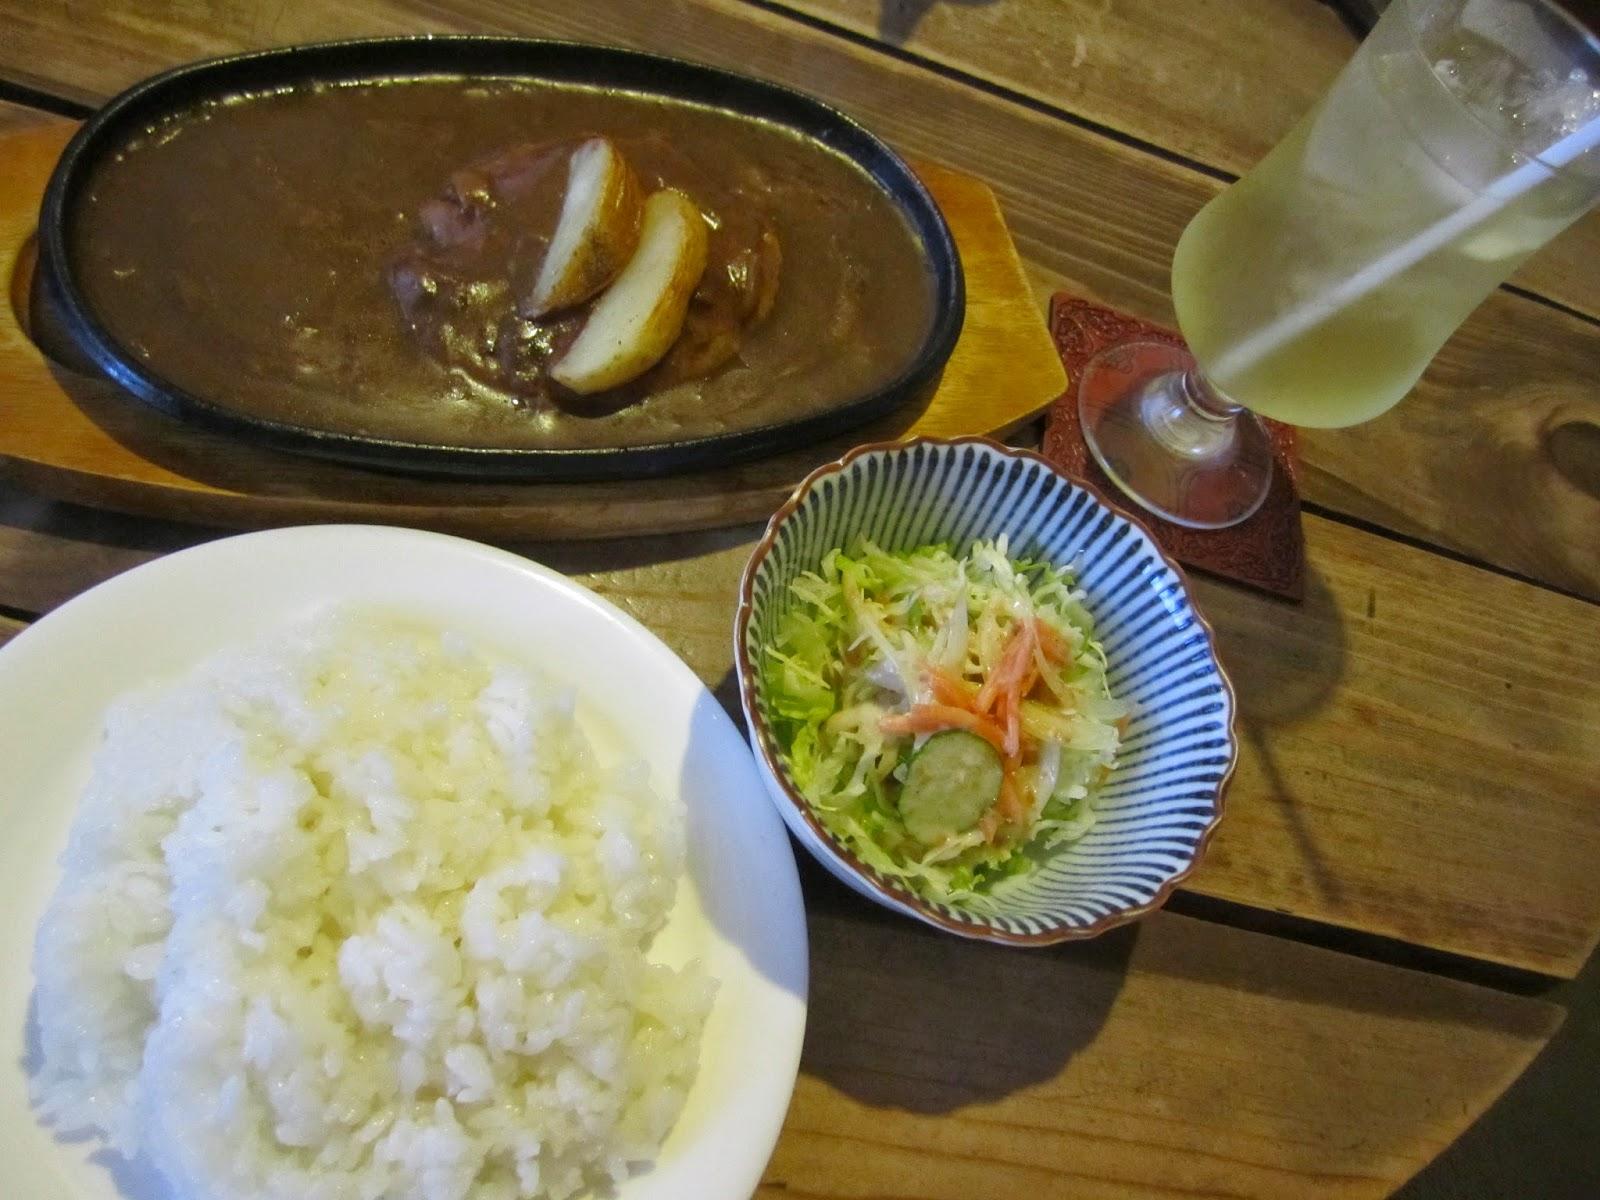 Hamburg Curry Gaucho Towada Cafe ハンバーグカレー ガウチョ 十和田市 カフェ